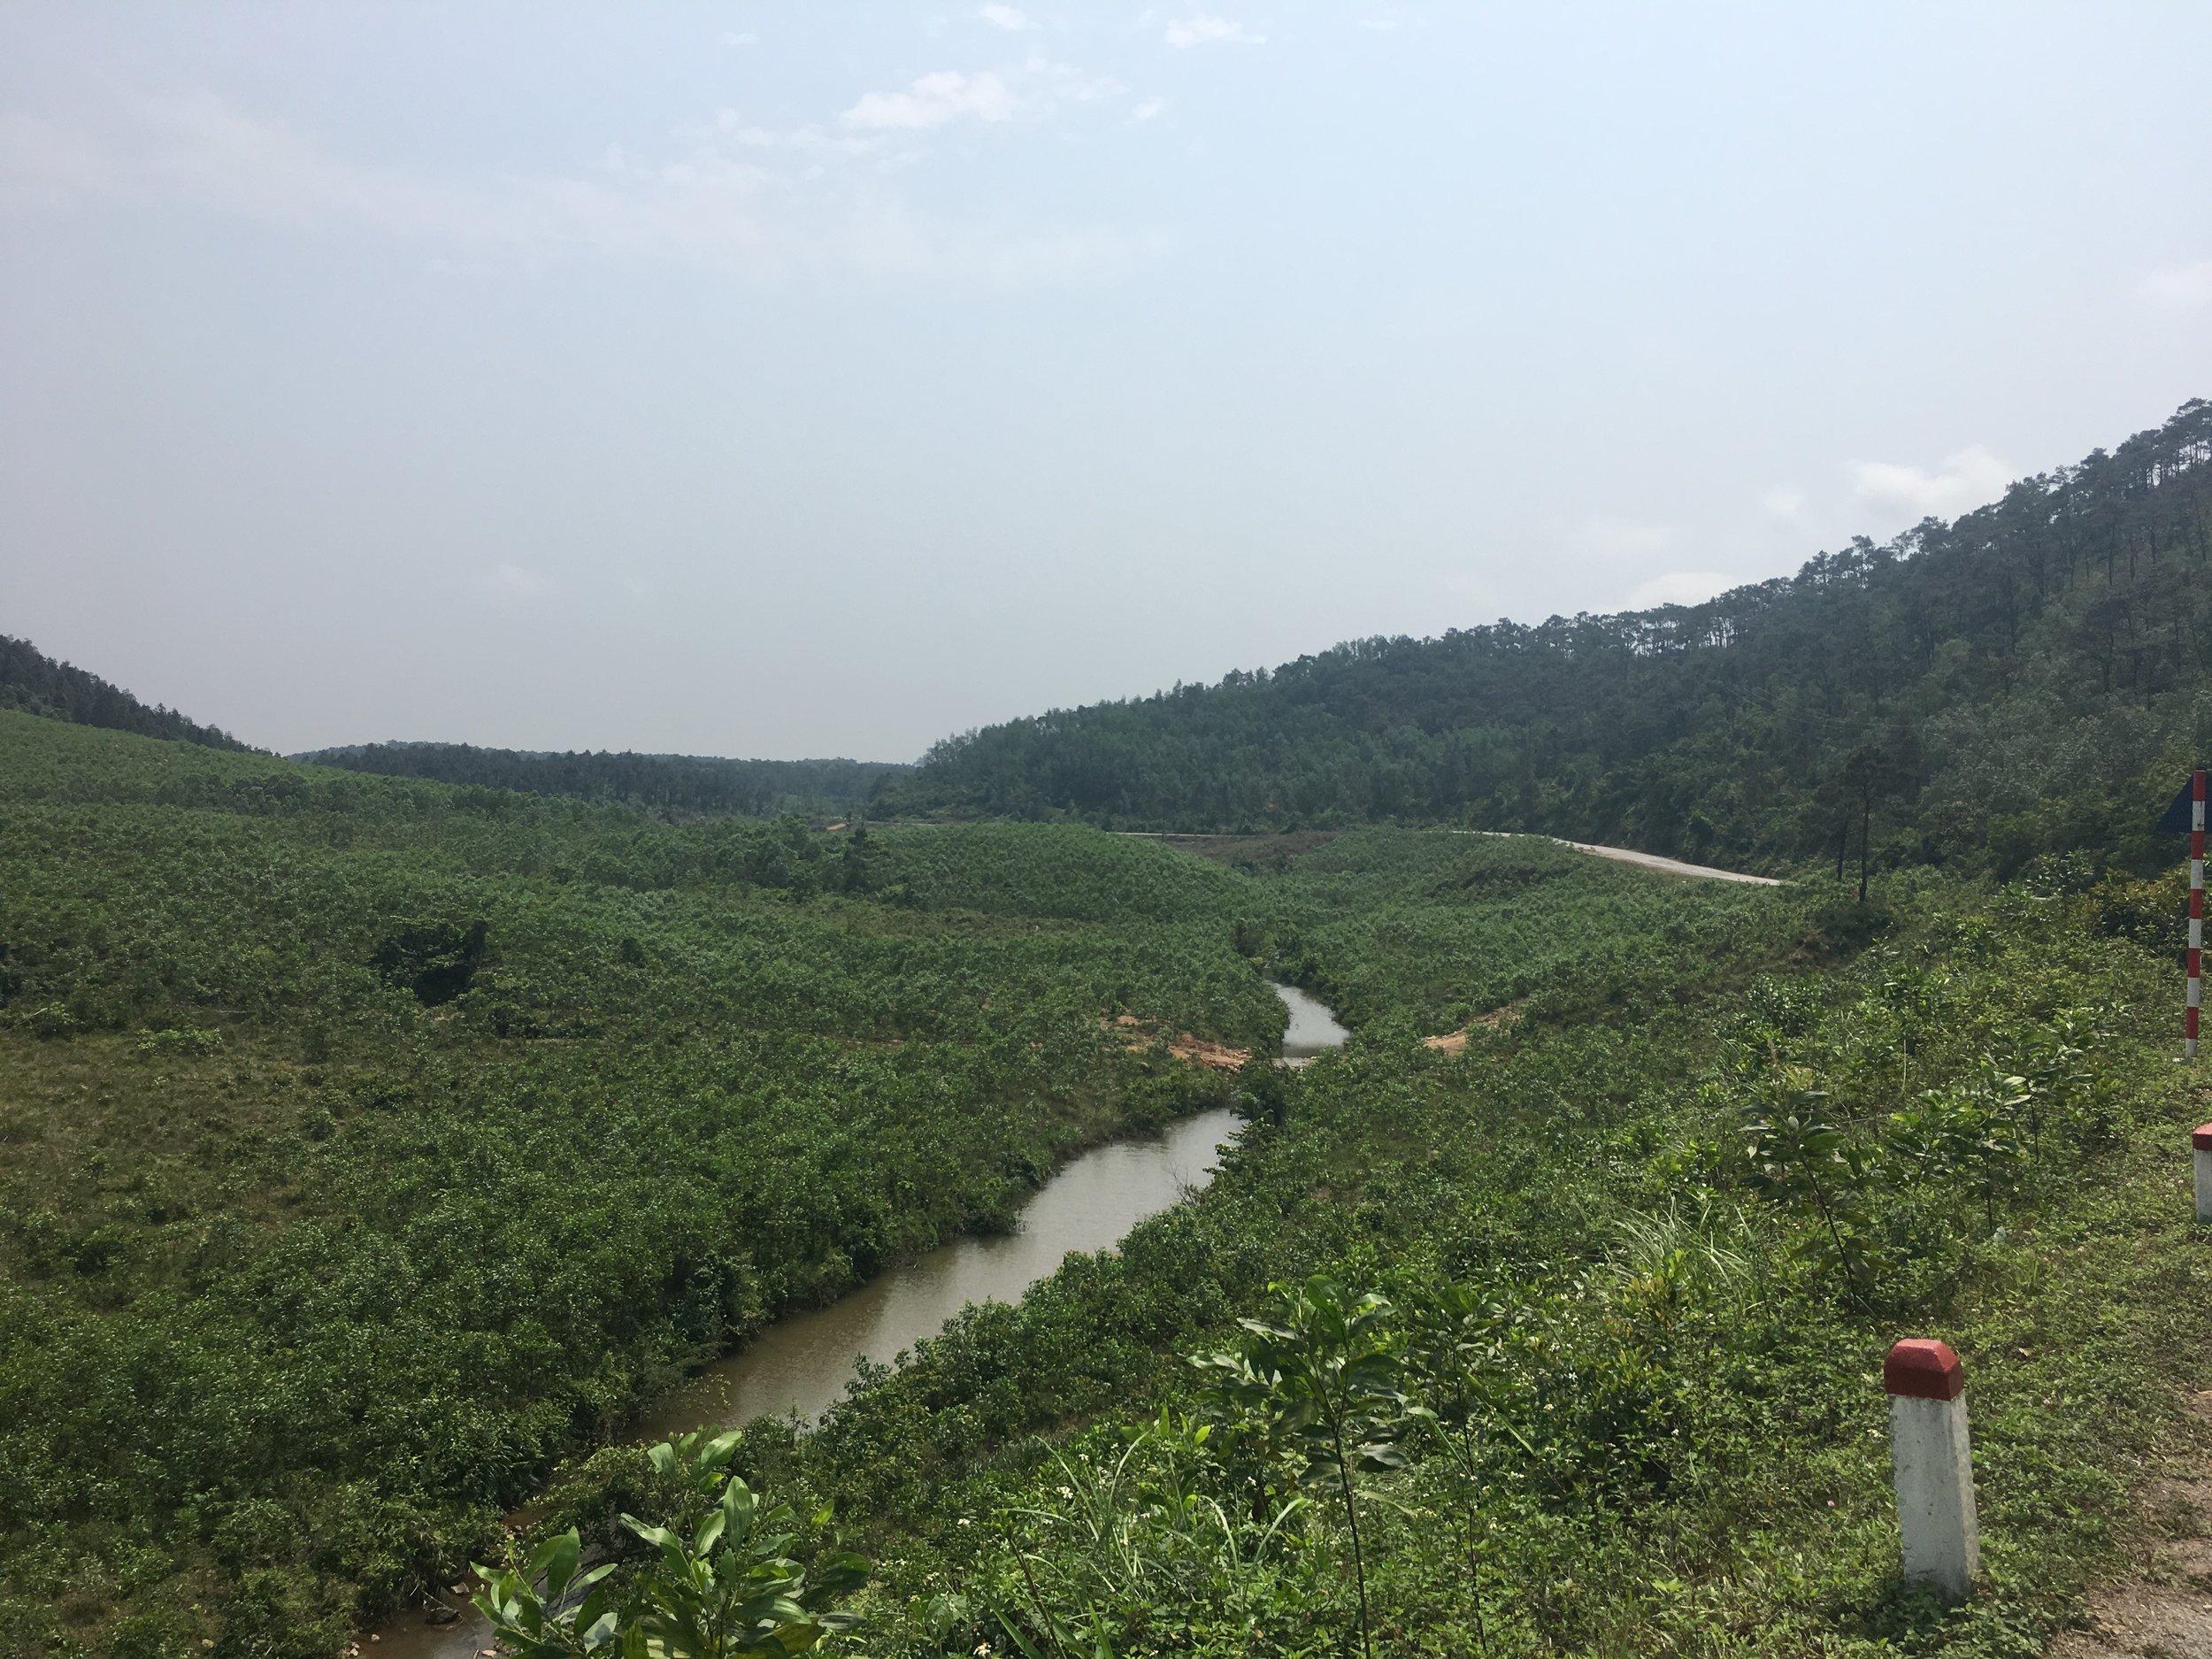 Leaving Phong Nha through the stunning countryside